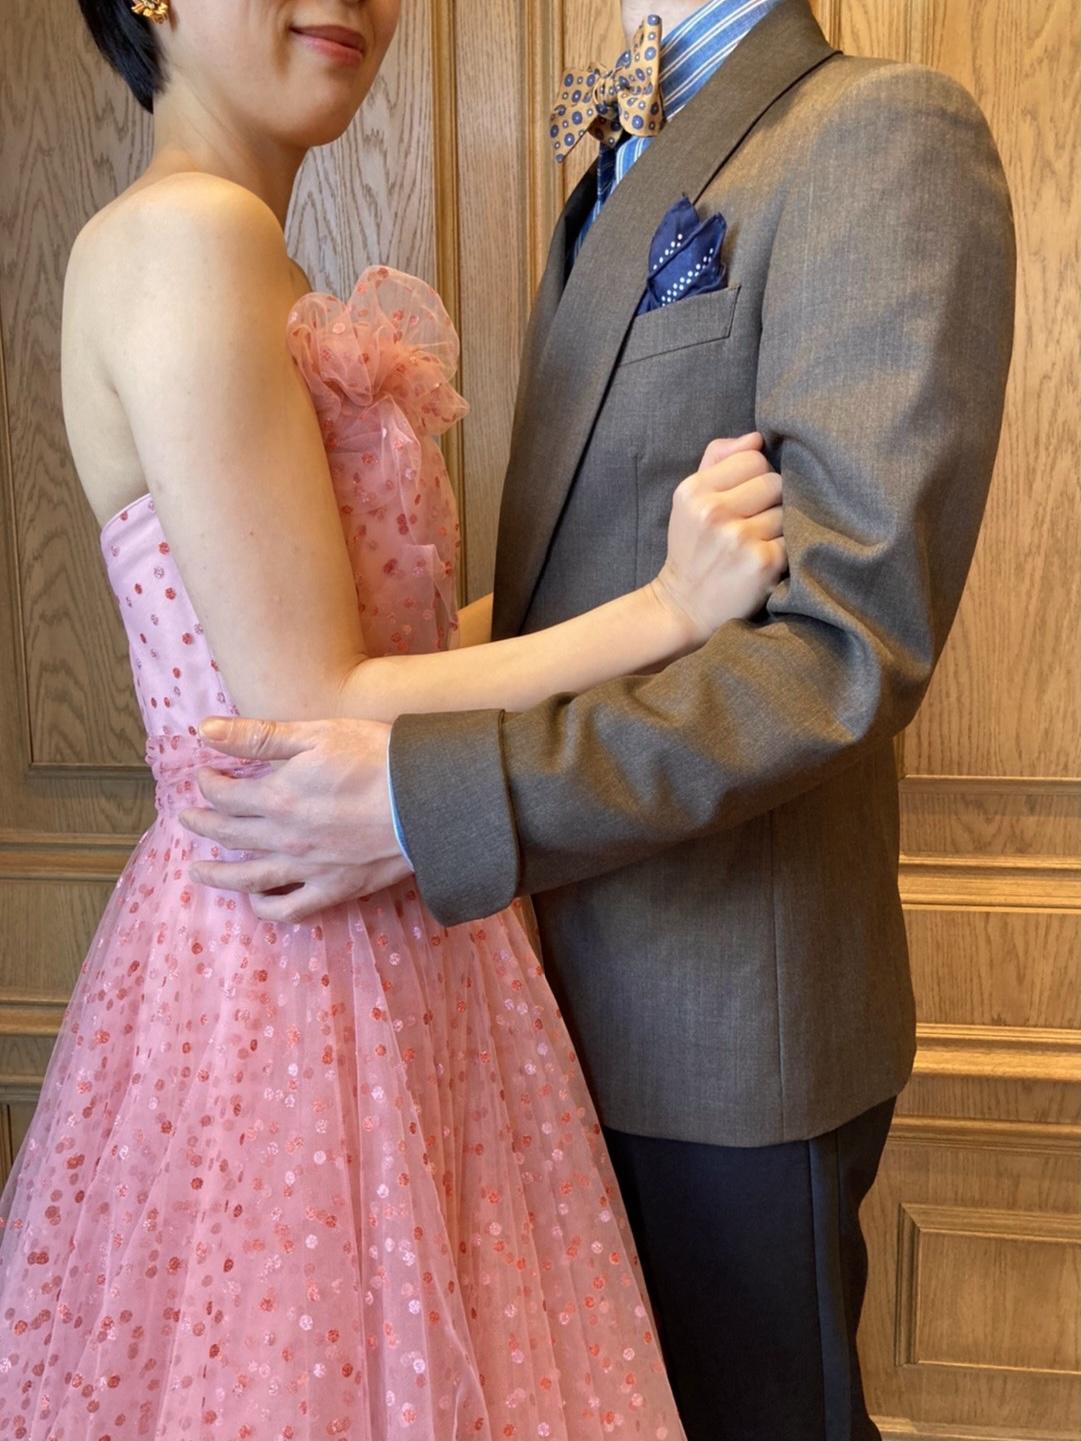 THETREATDRESSING名古屋店でおすすめするフェミニンなカラードレスとブラウンのジャケットを使用したご新郎様のコーディネート